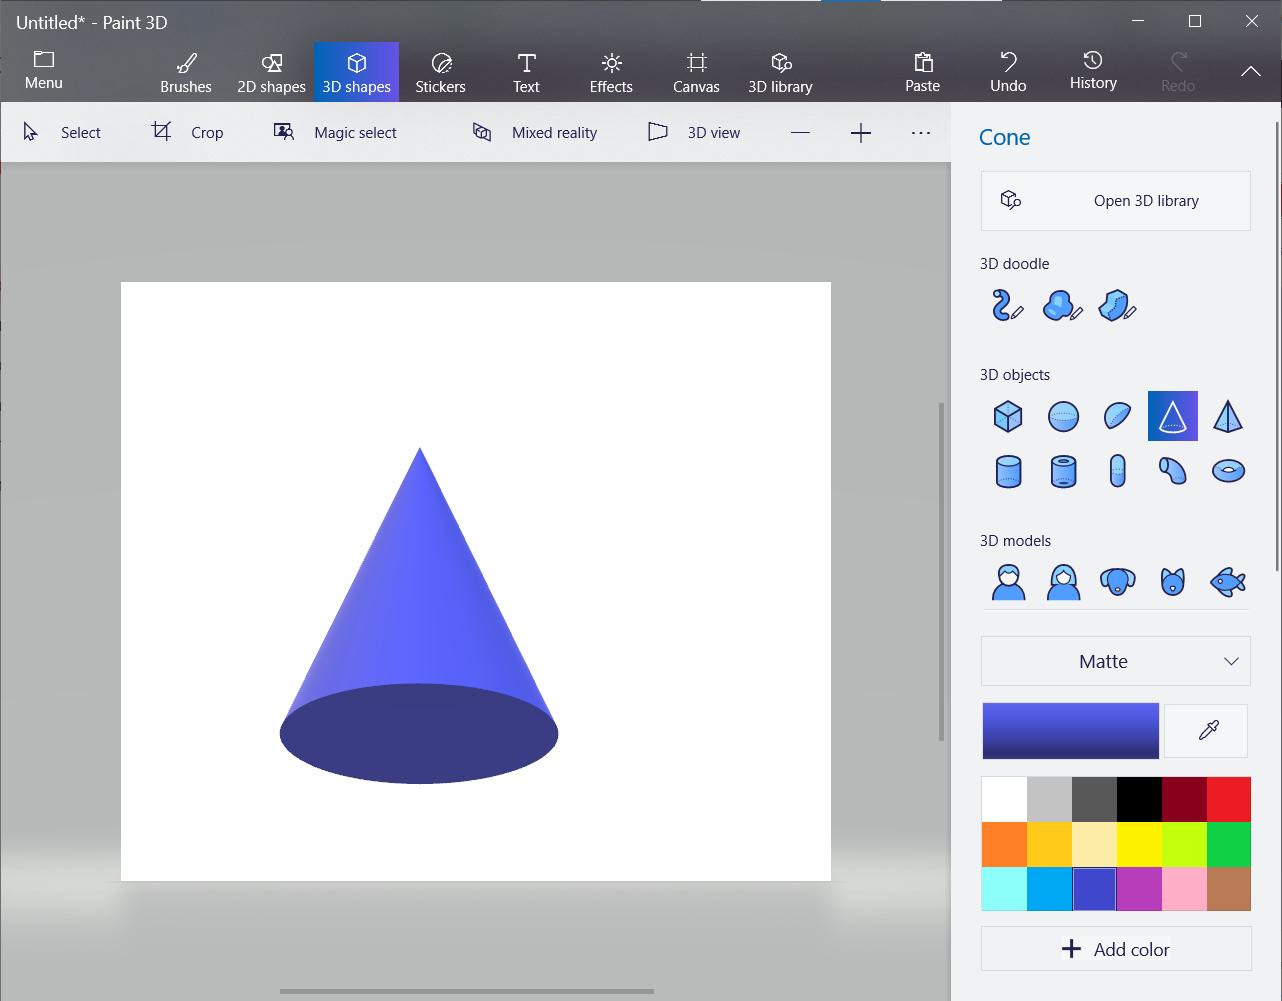 Screenshot of 3D object in Microsoft Paint.